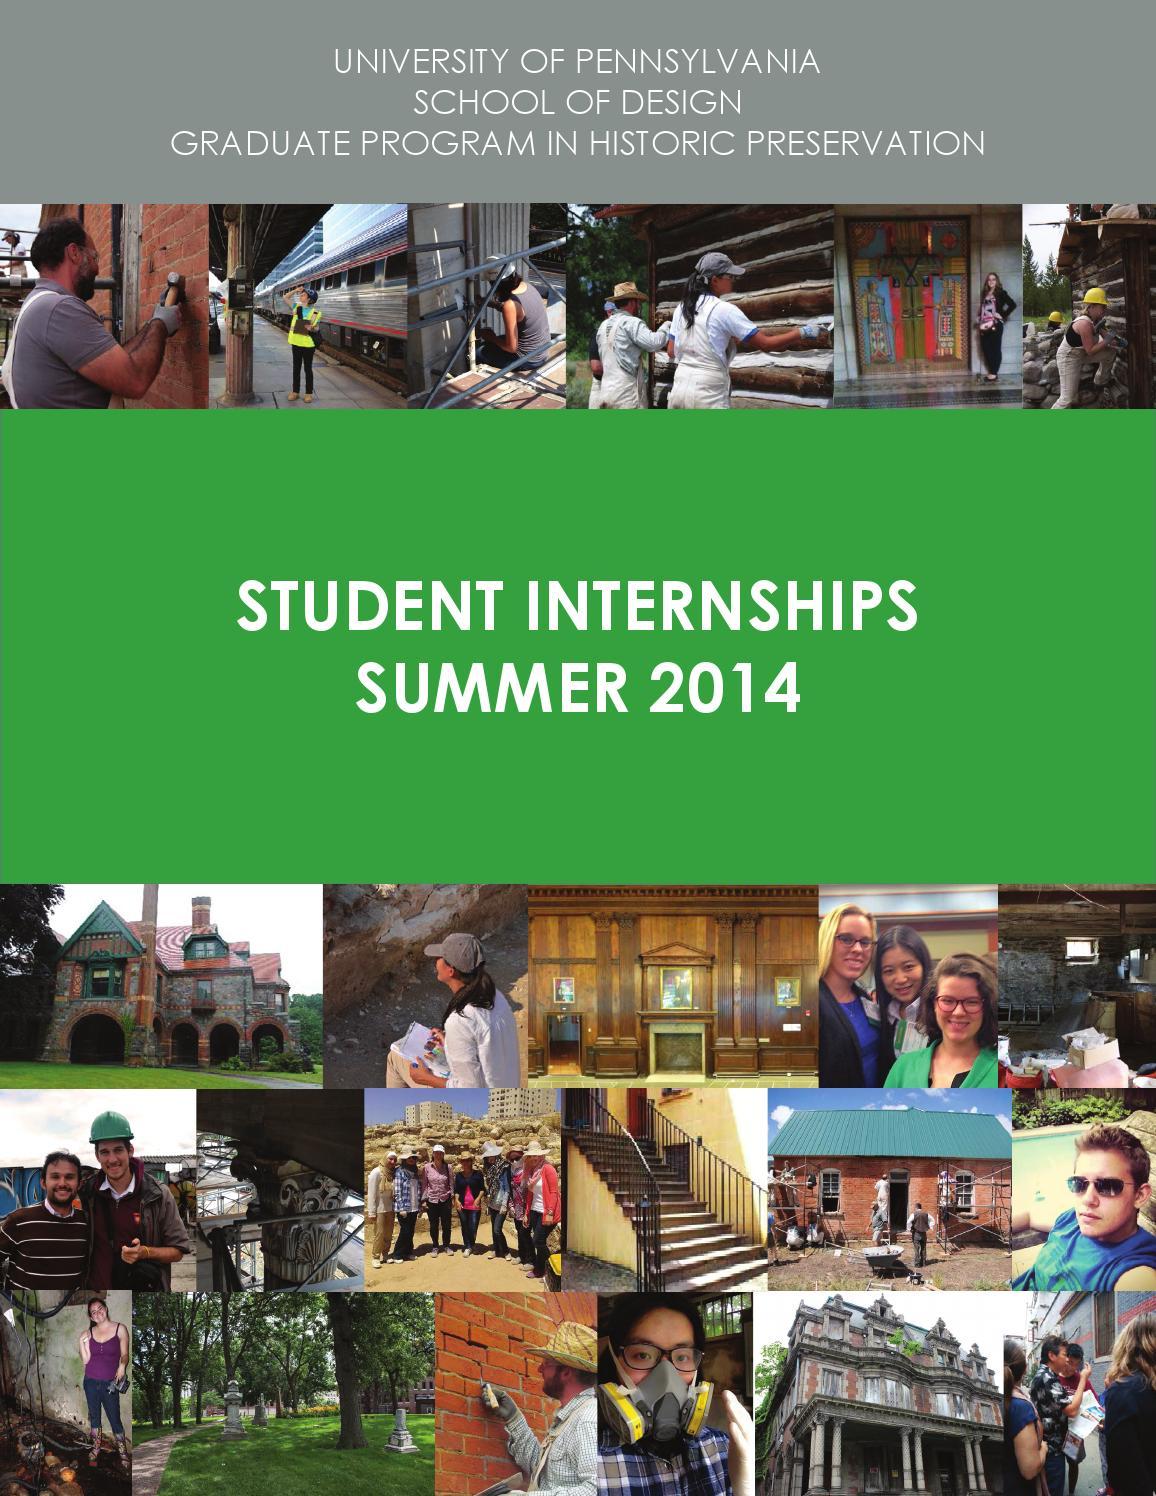 Penndesign Historic Preservation 2014 Student Summer Internships By Amanda  Bloomfield - Issuu